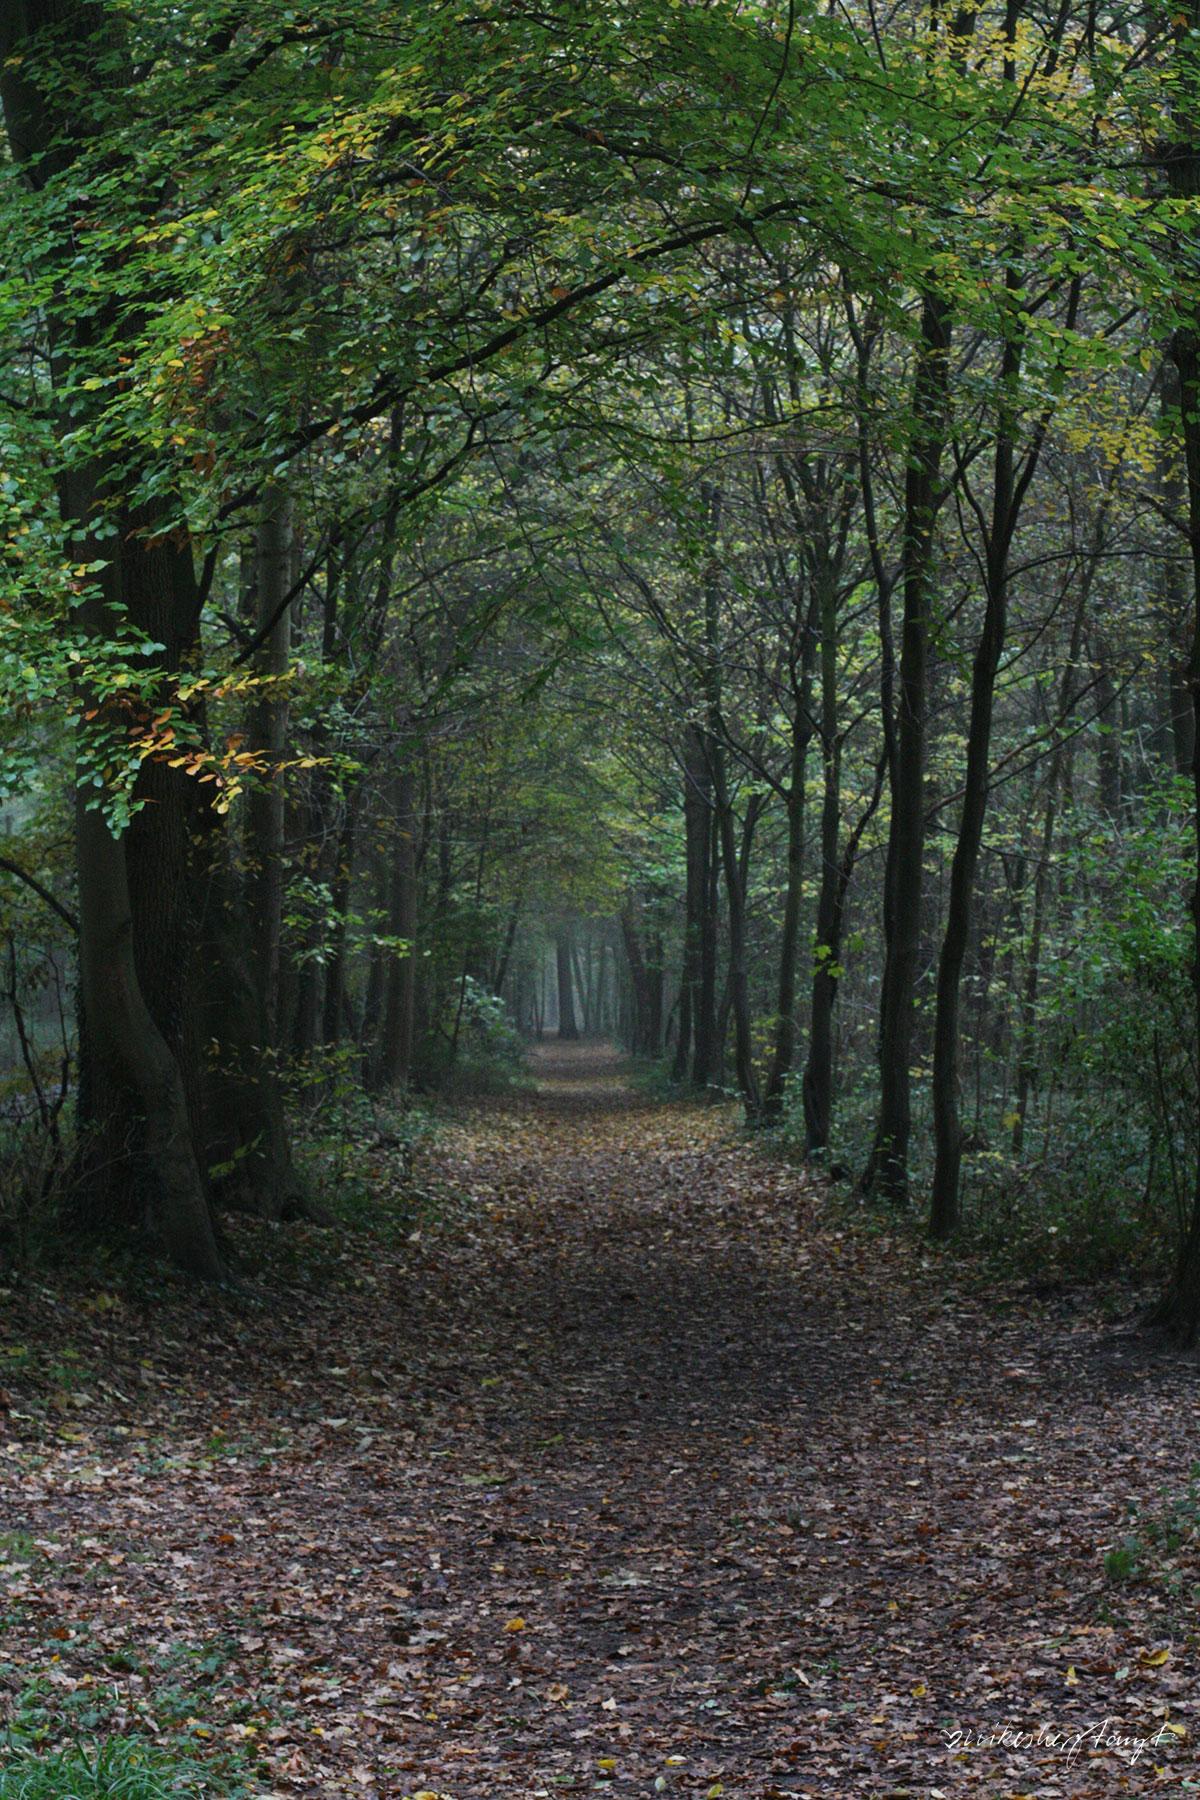 forstwald, krefeld, #nikeskrefeld, into the trees, the forest, wald, herbst, laub, nikesherztanzt